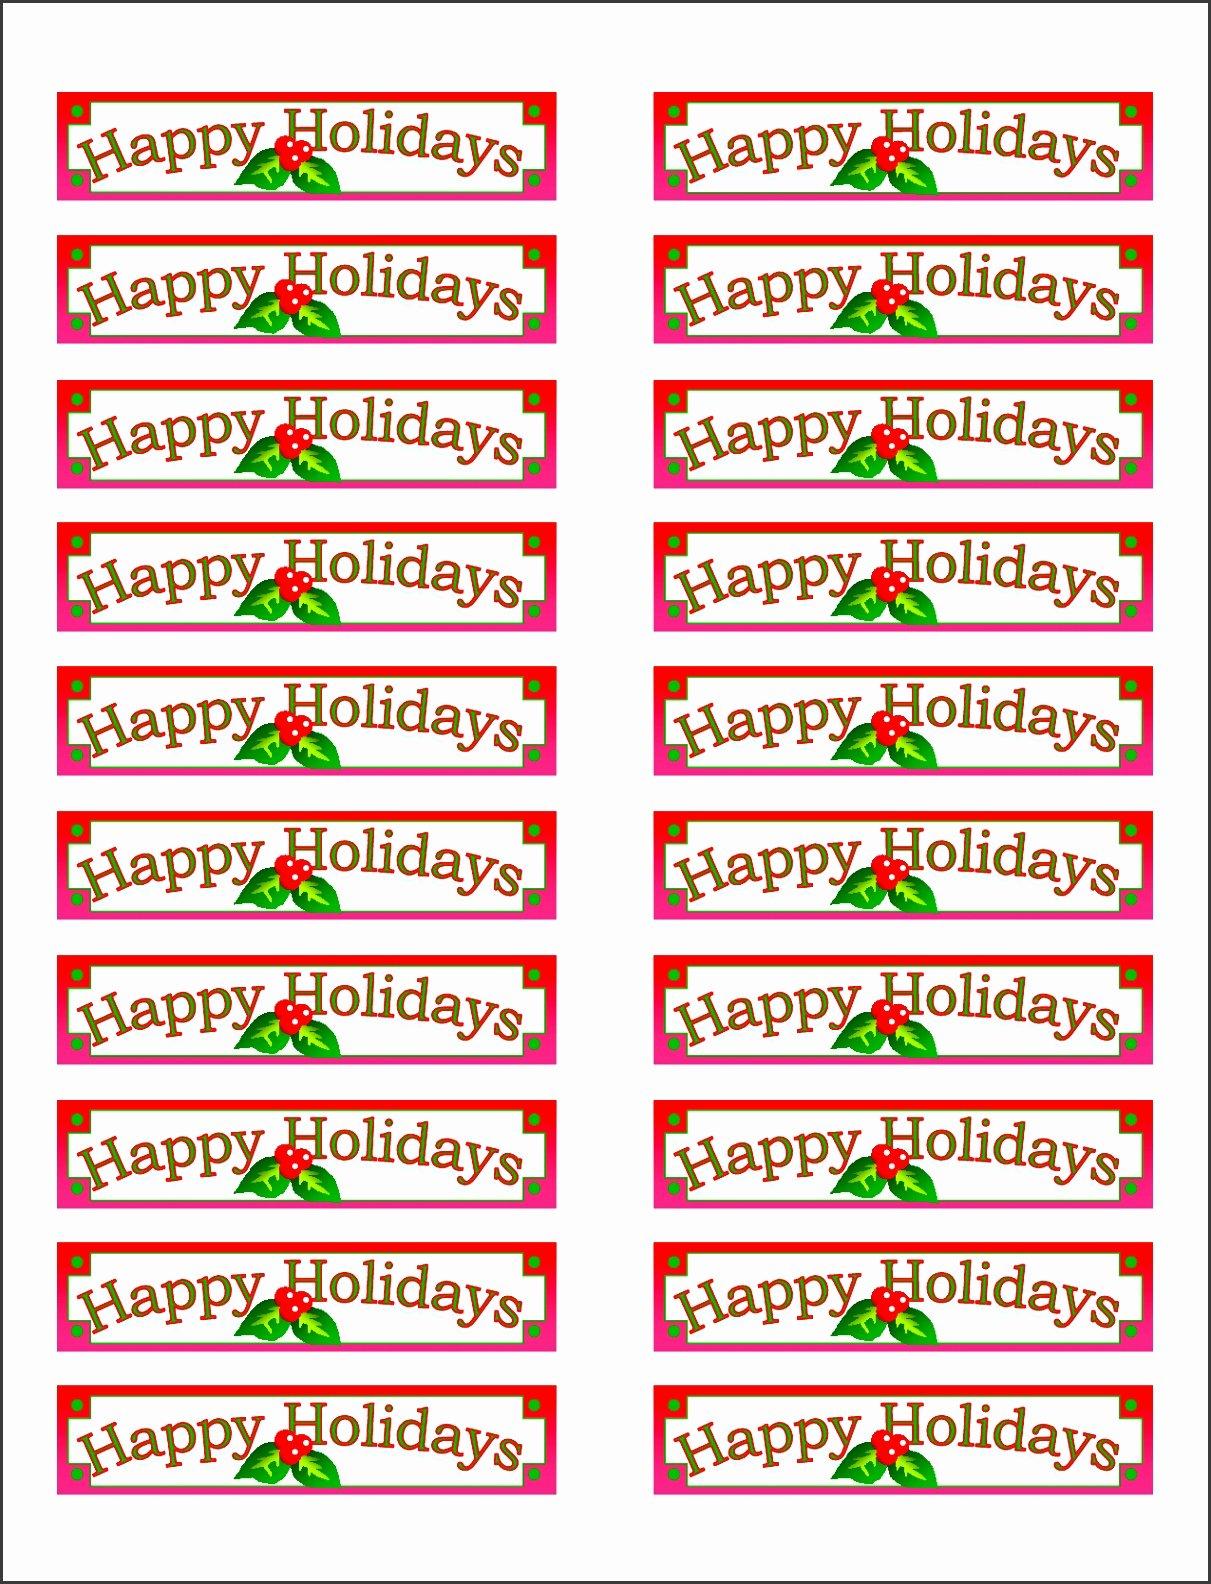 Polaroid Mailing Label Templates Inspirational 9 Polaroid Mailing Label Template 30 Per Sheet